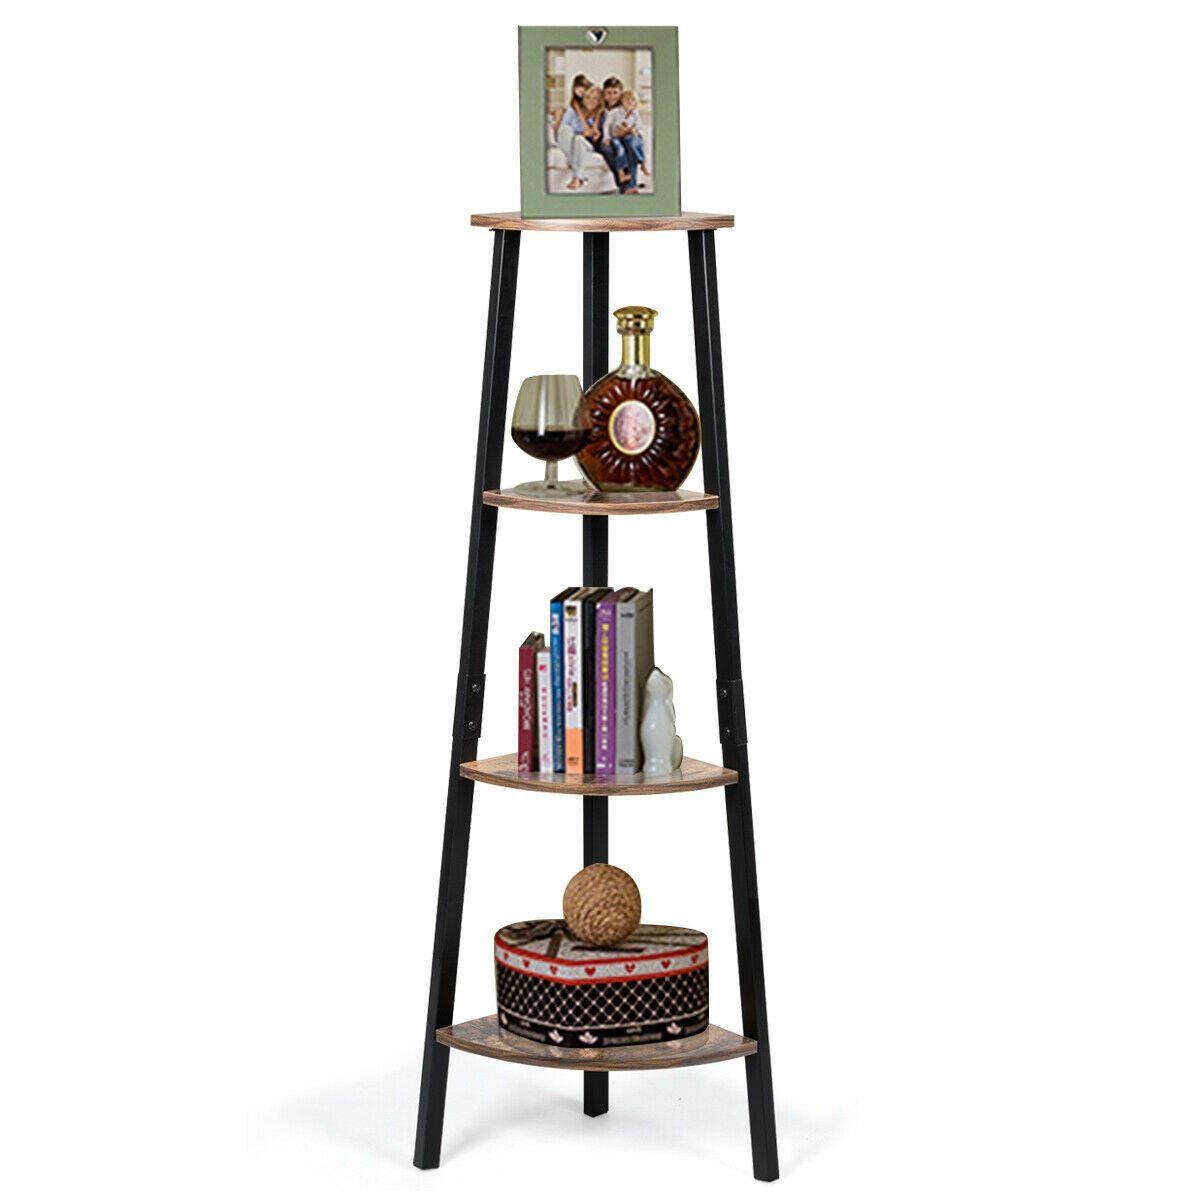 4 Tier Corner Shelf Metal Storage Rack Bookcase Plant Display